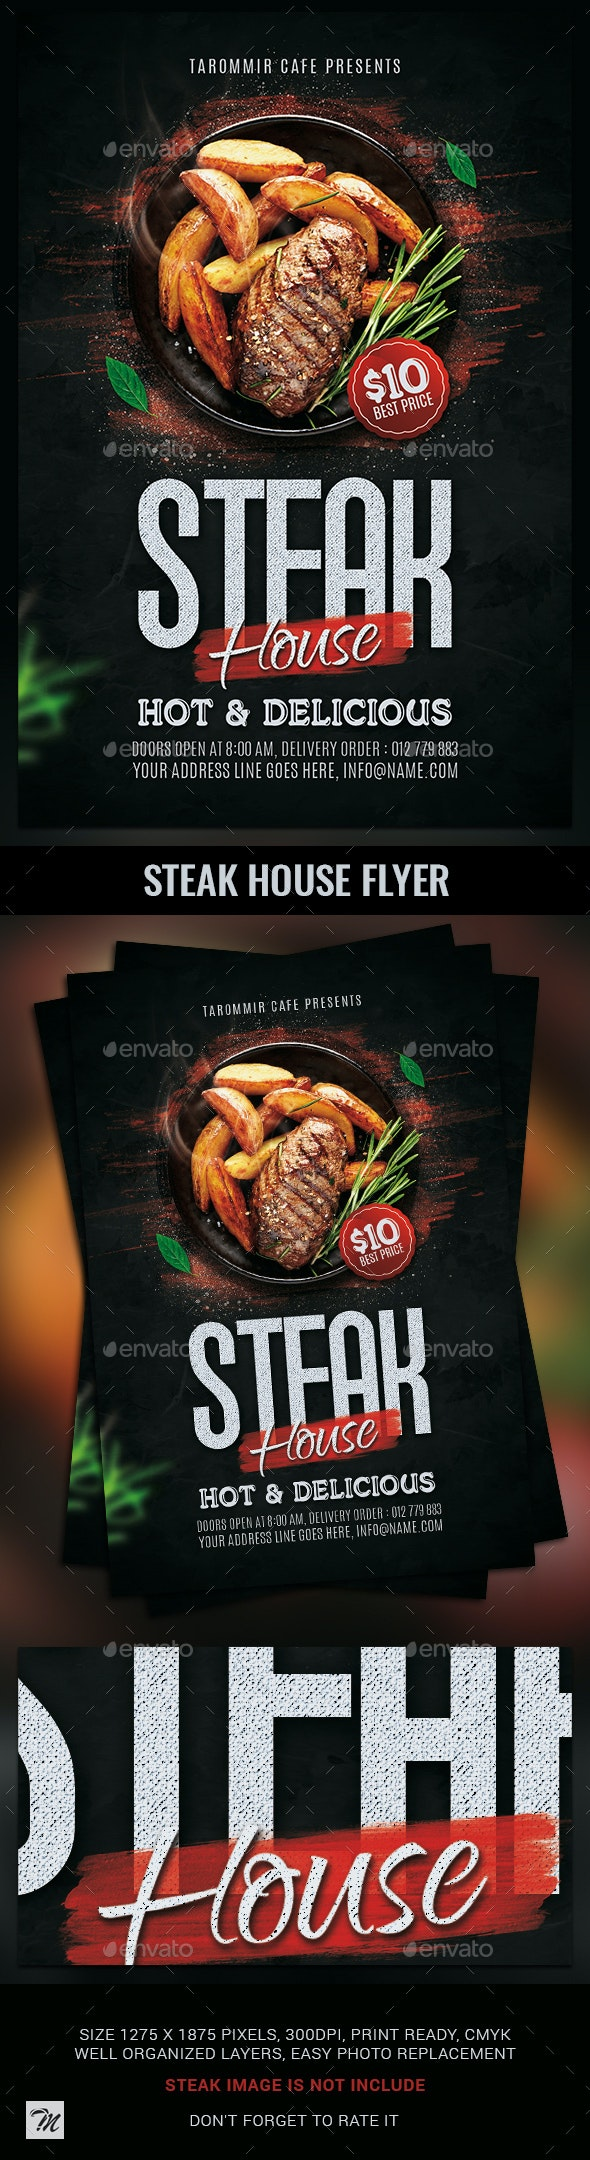 Steak House Flyer Template - Restaurant Flyers